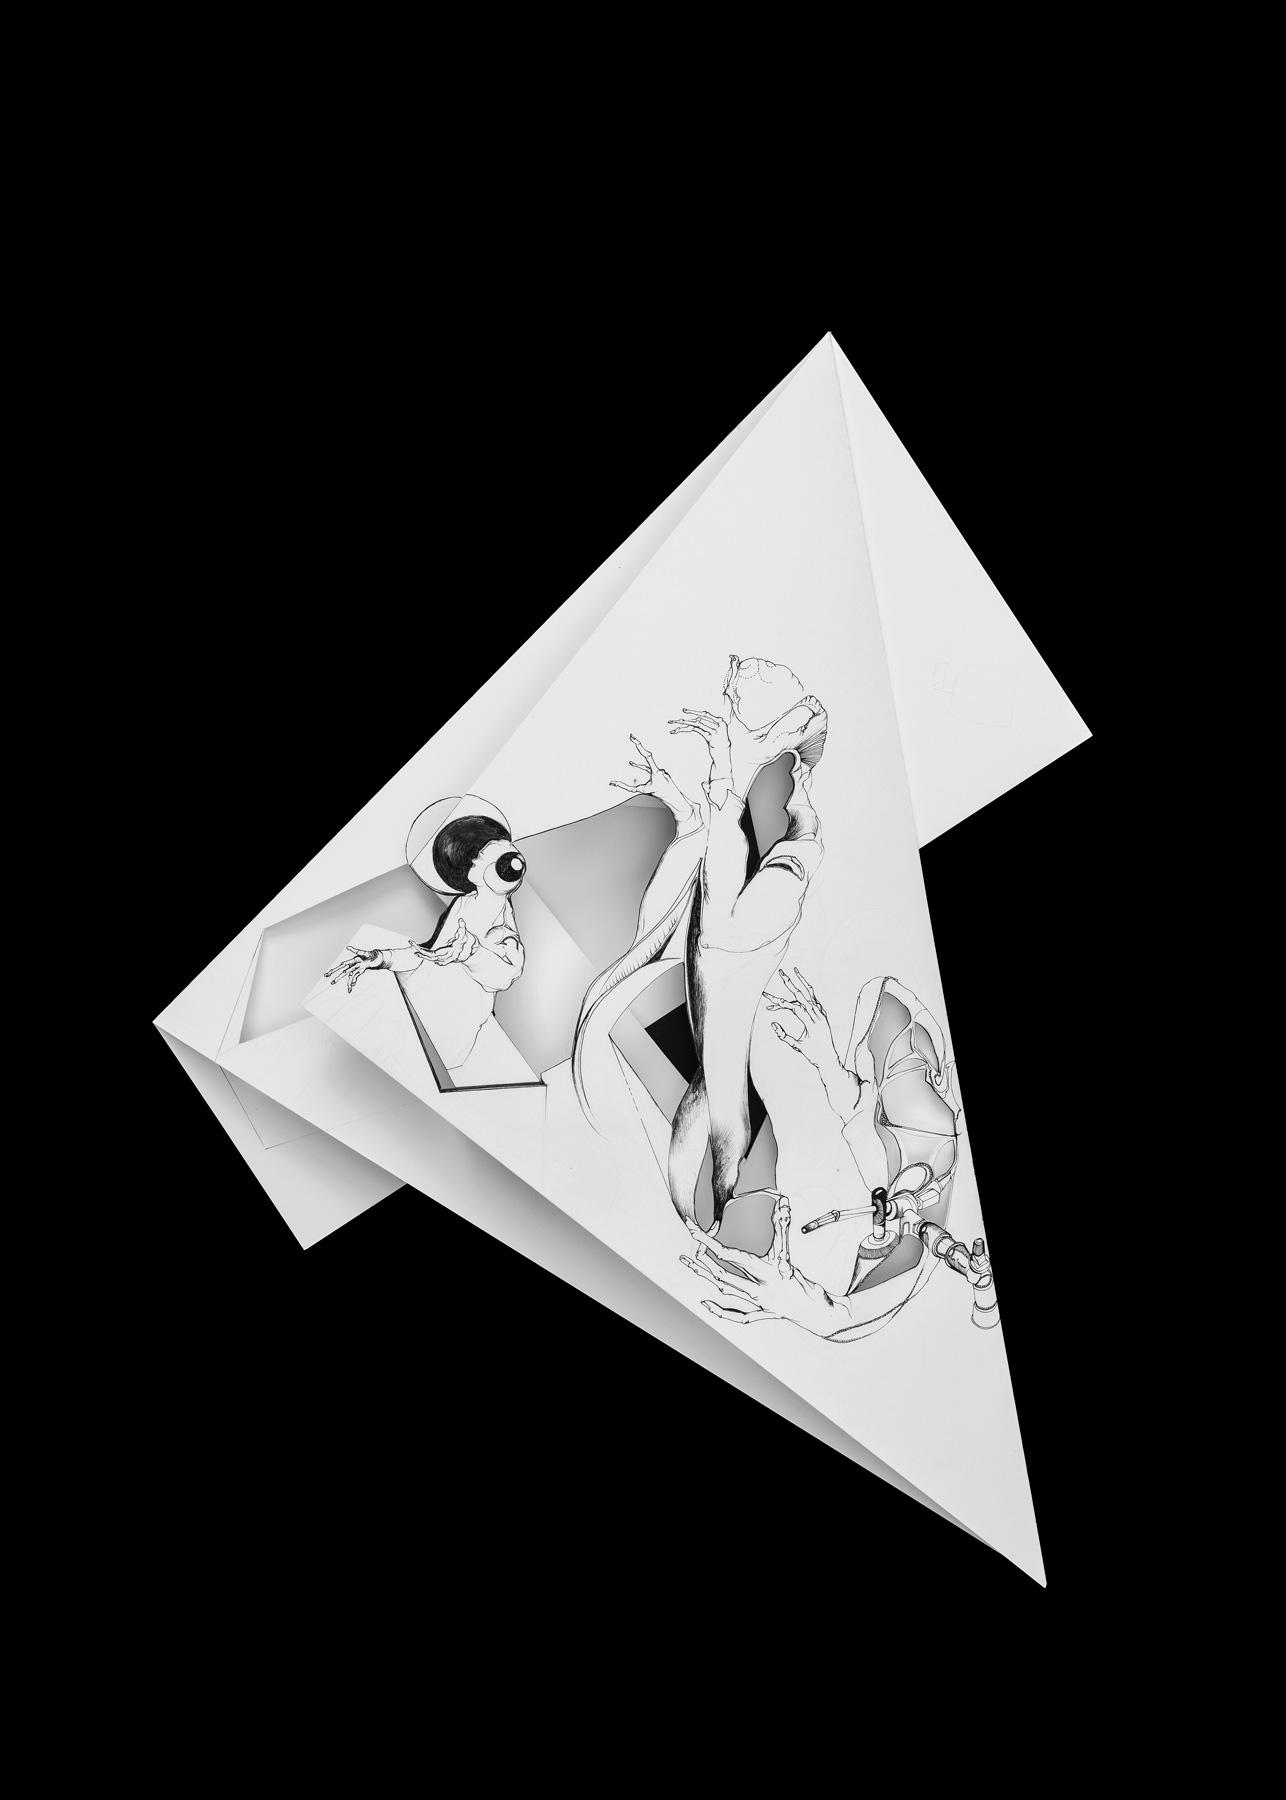 Nina Annabelle Märkl | Fragmented fiction 13 | Ink on folded paper, cut-outs | 44 x 38 cm | 2016